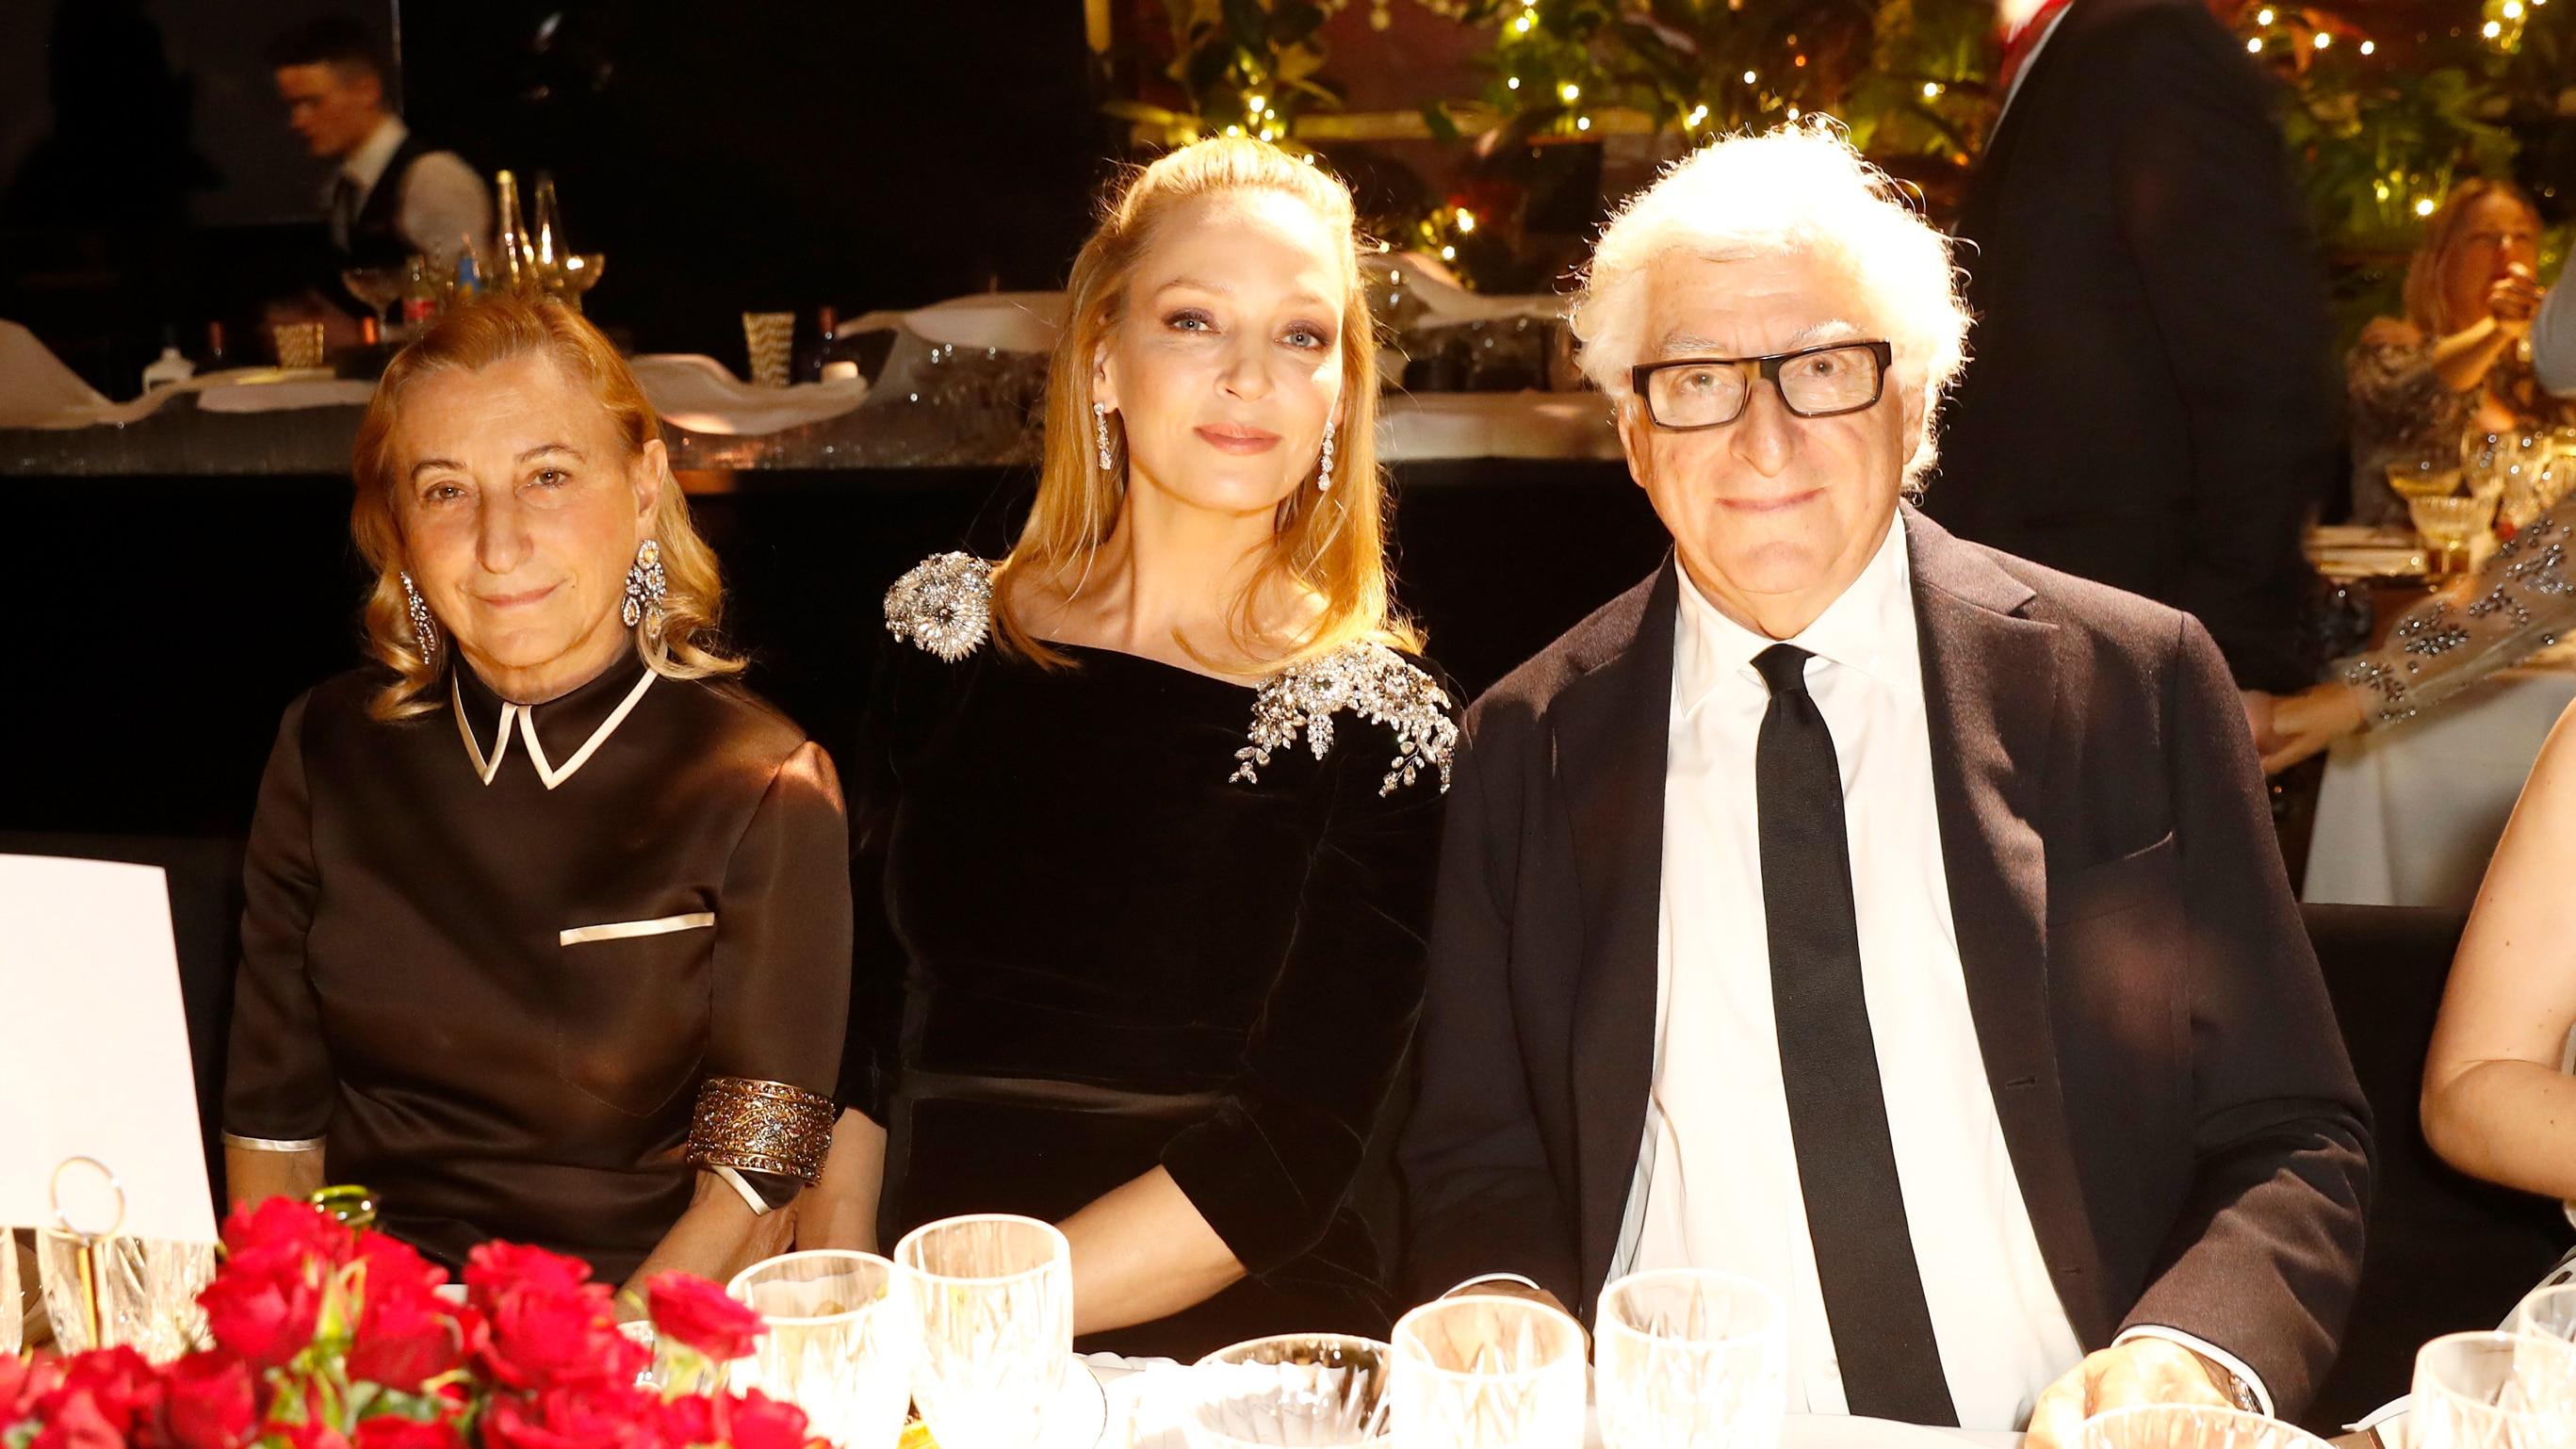 The British Fashion Awards, Bottega Veneta's new dawn, and more fashion news